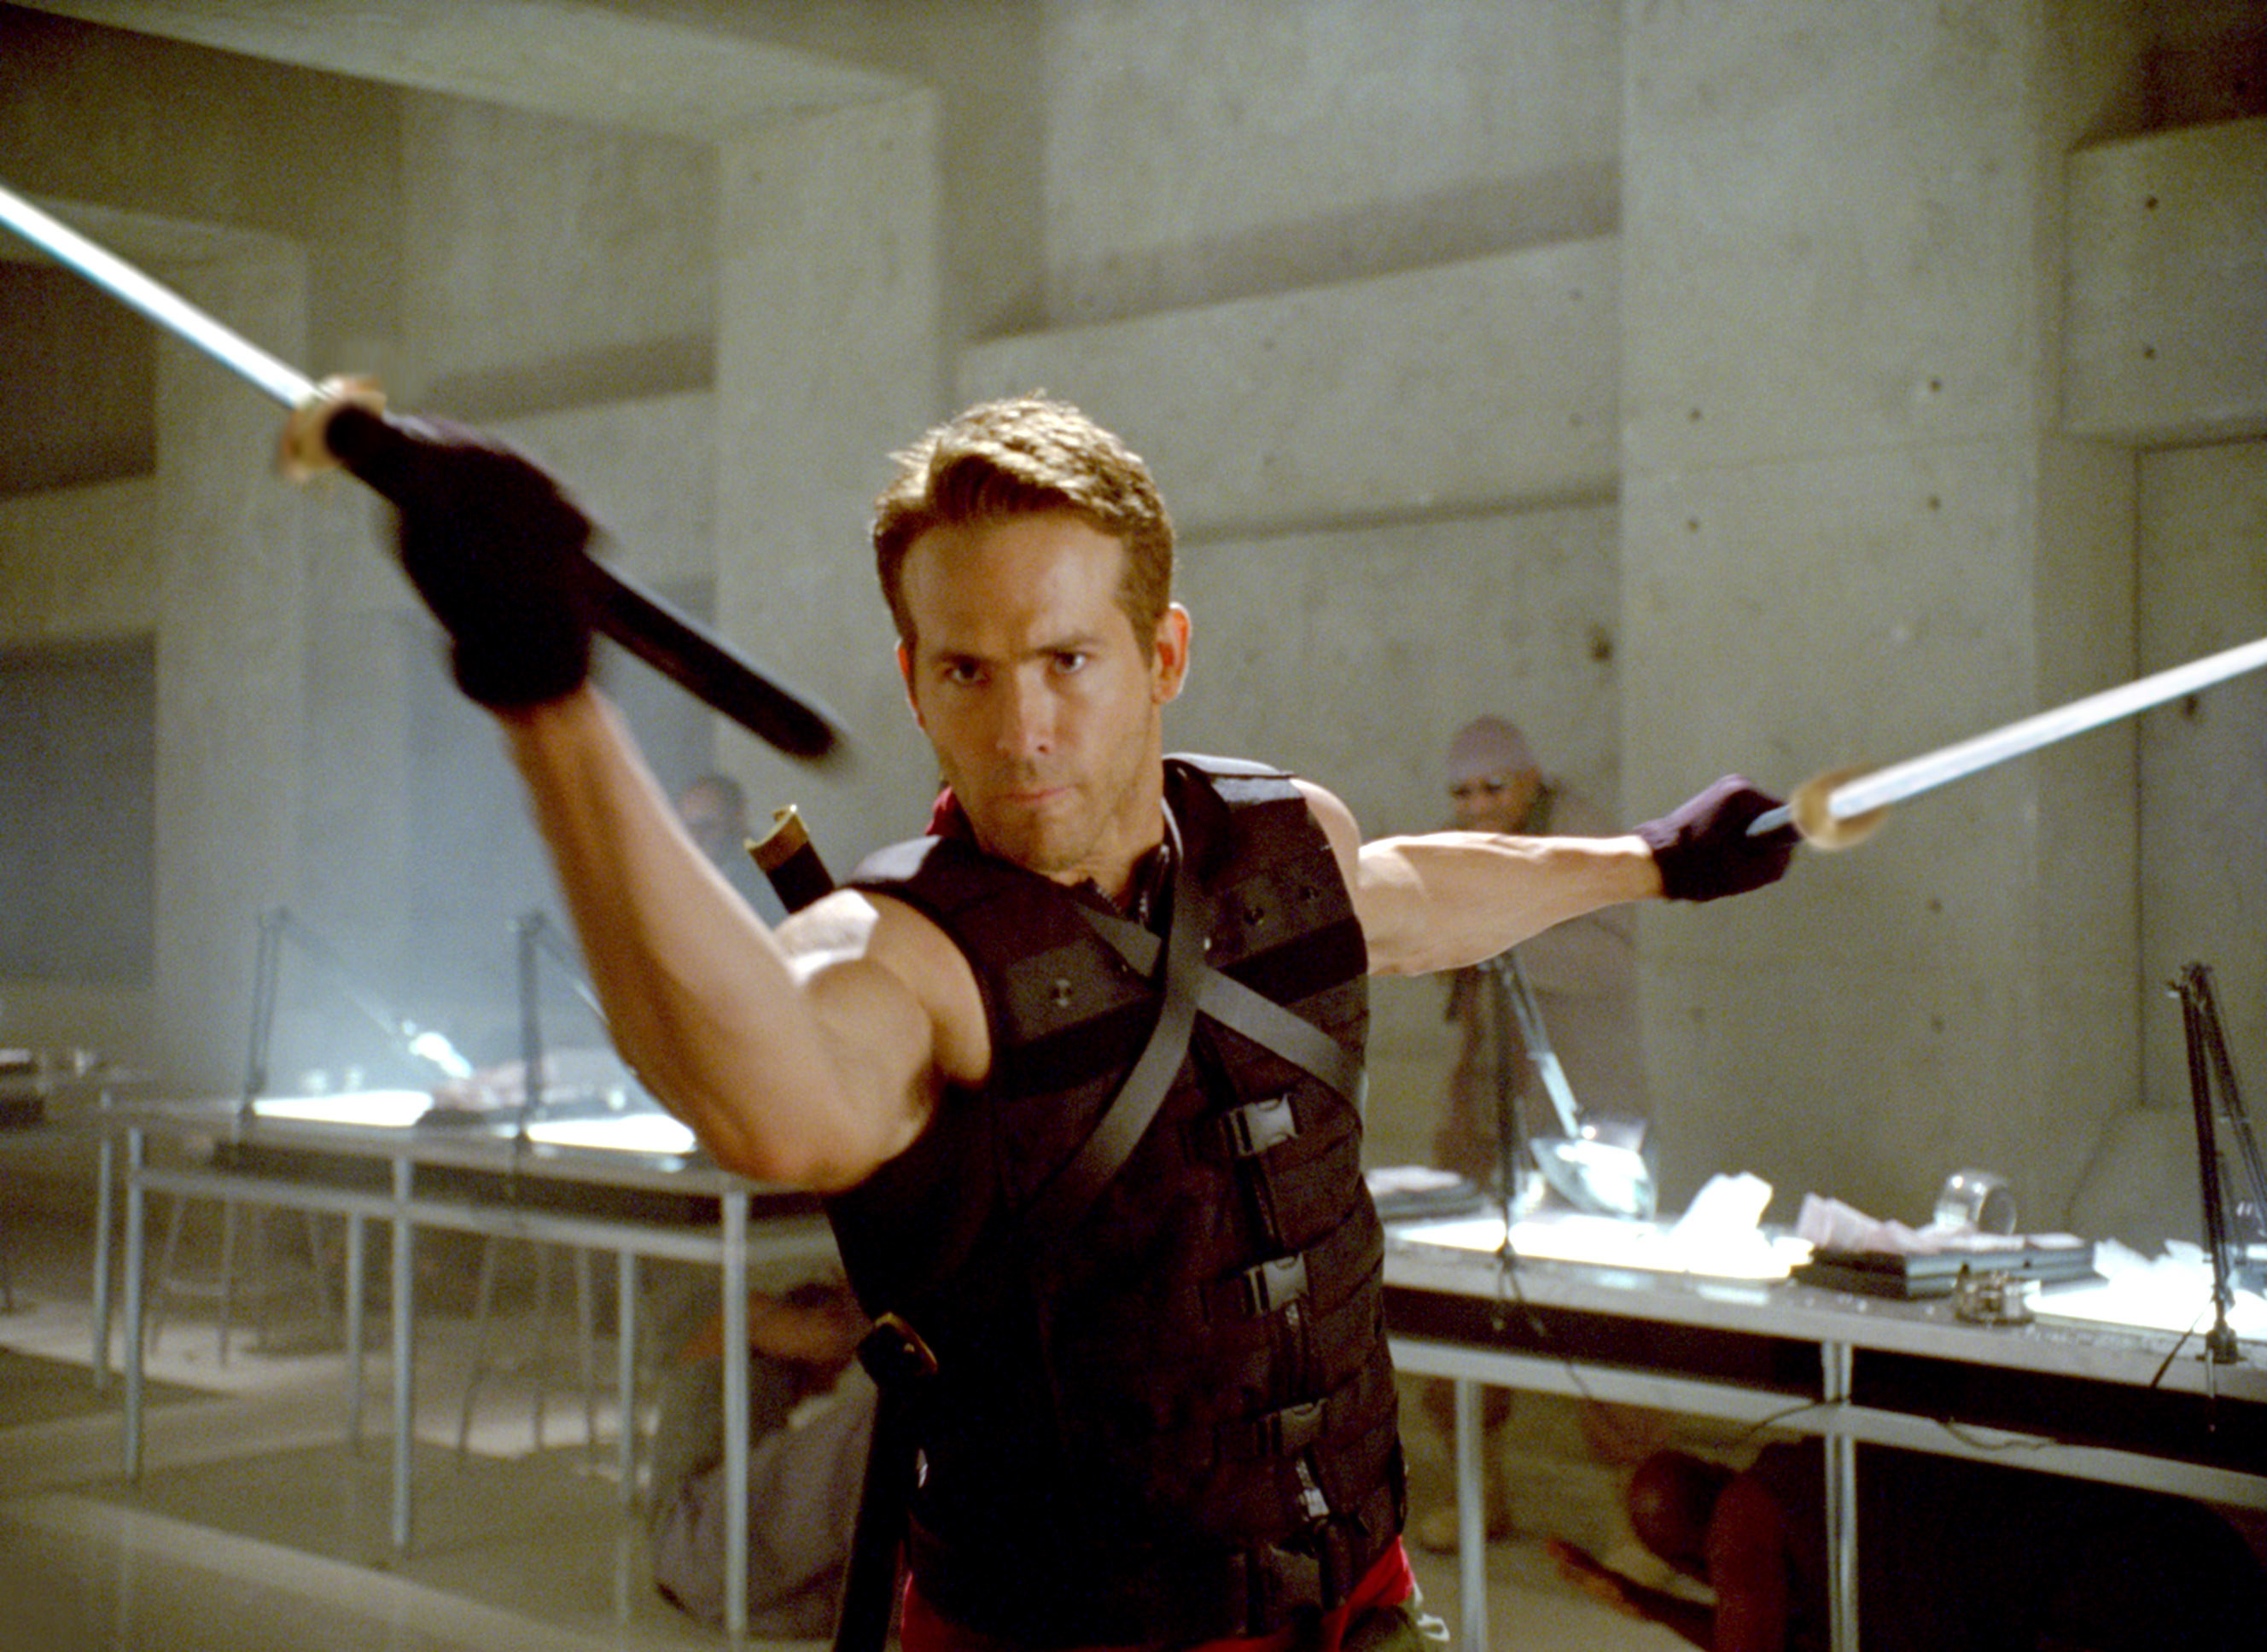 Reynolds as Deadpool in the film